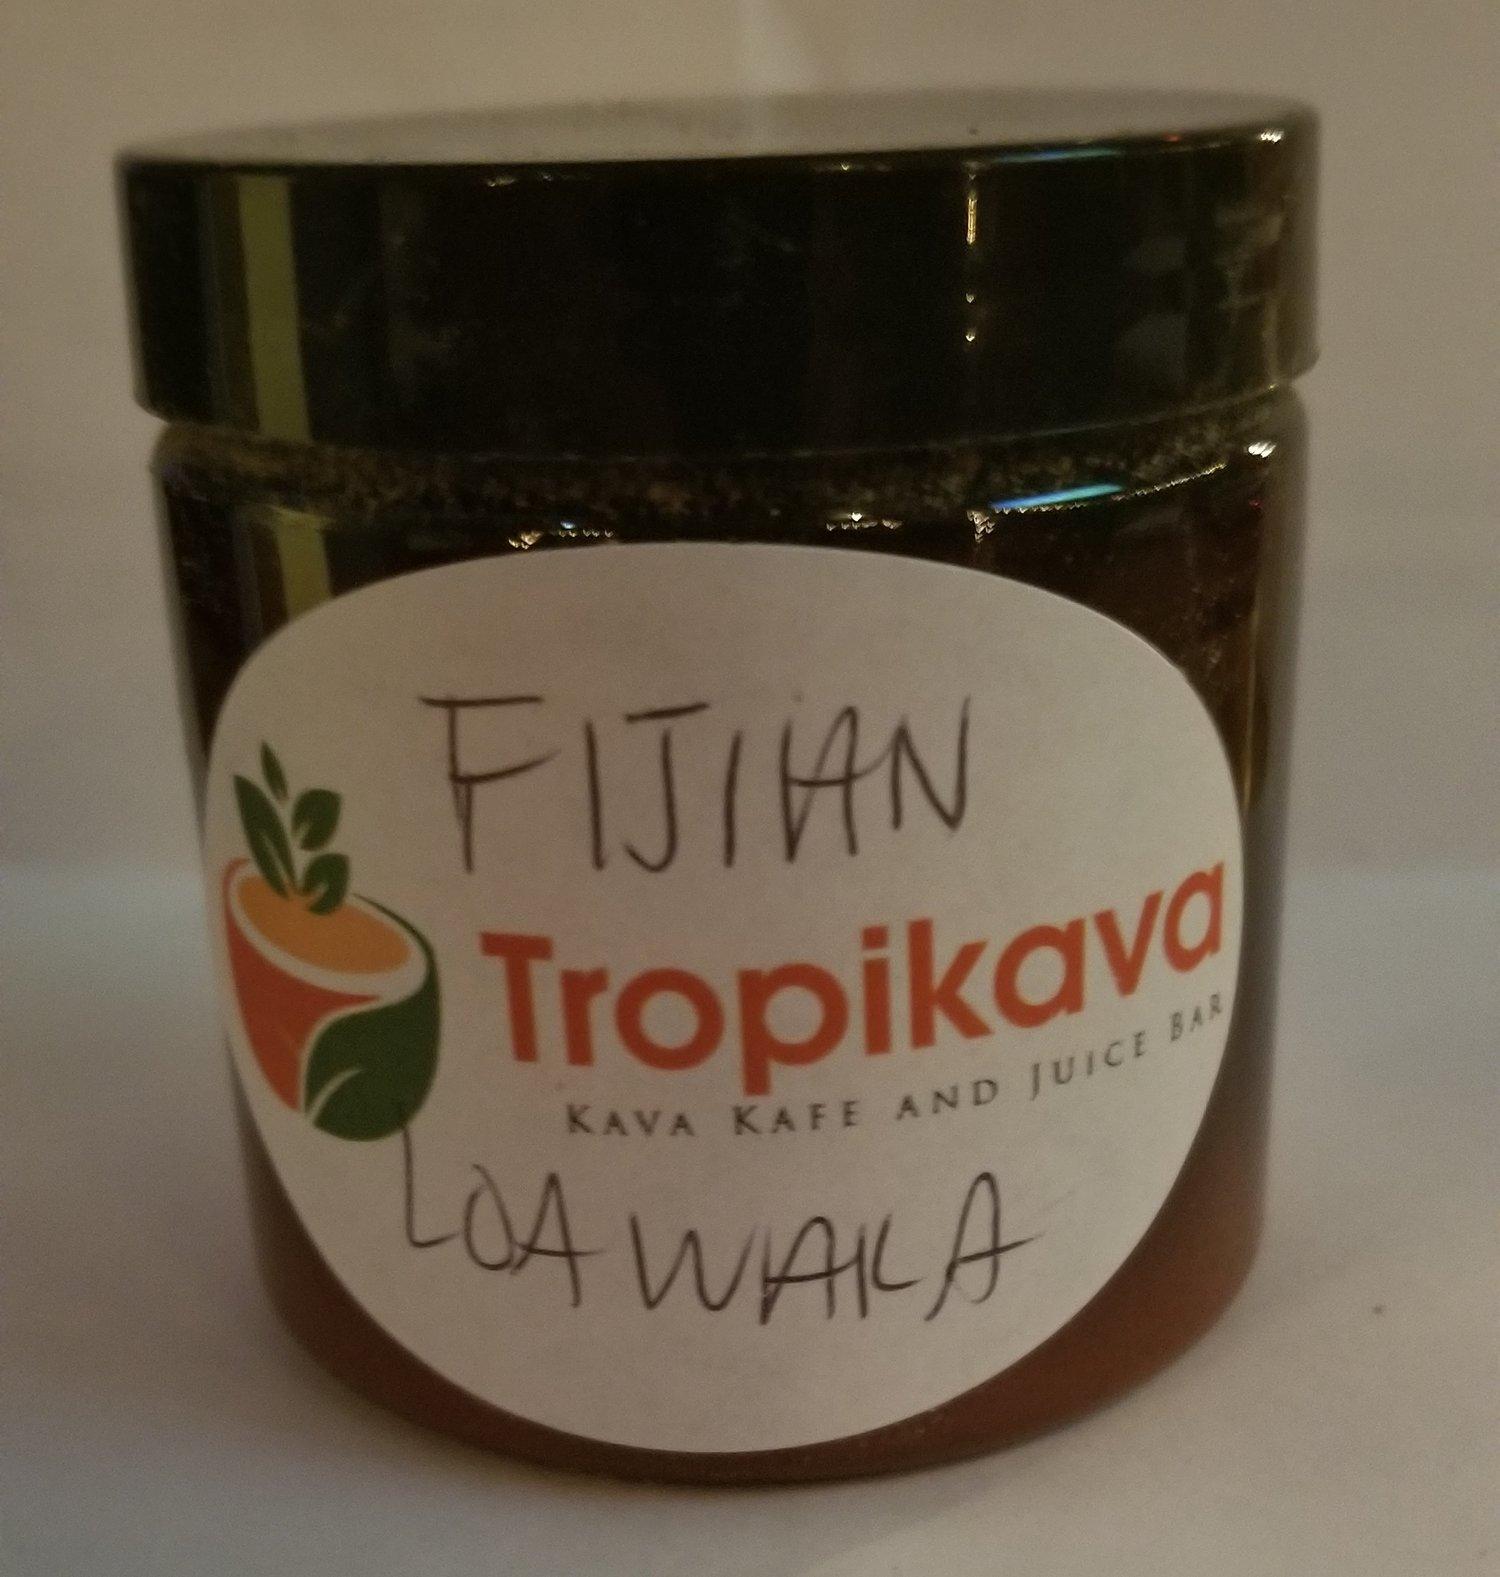 Micronized instant Kava — Tropikava